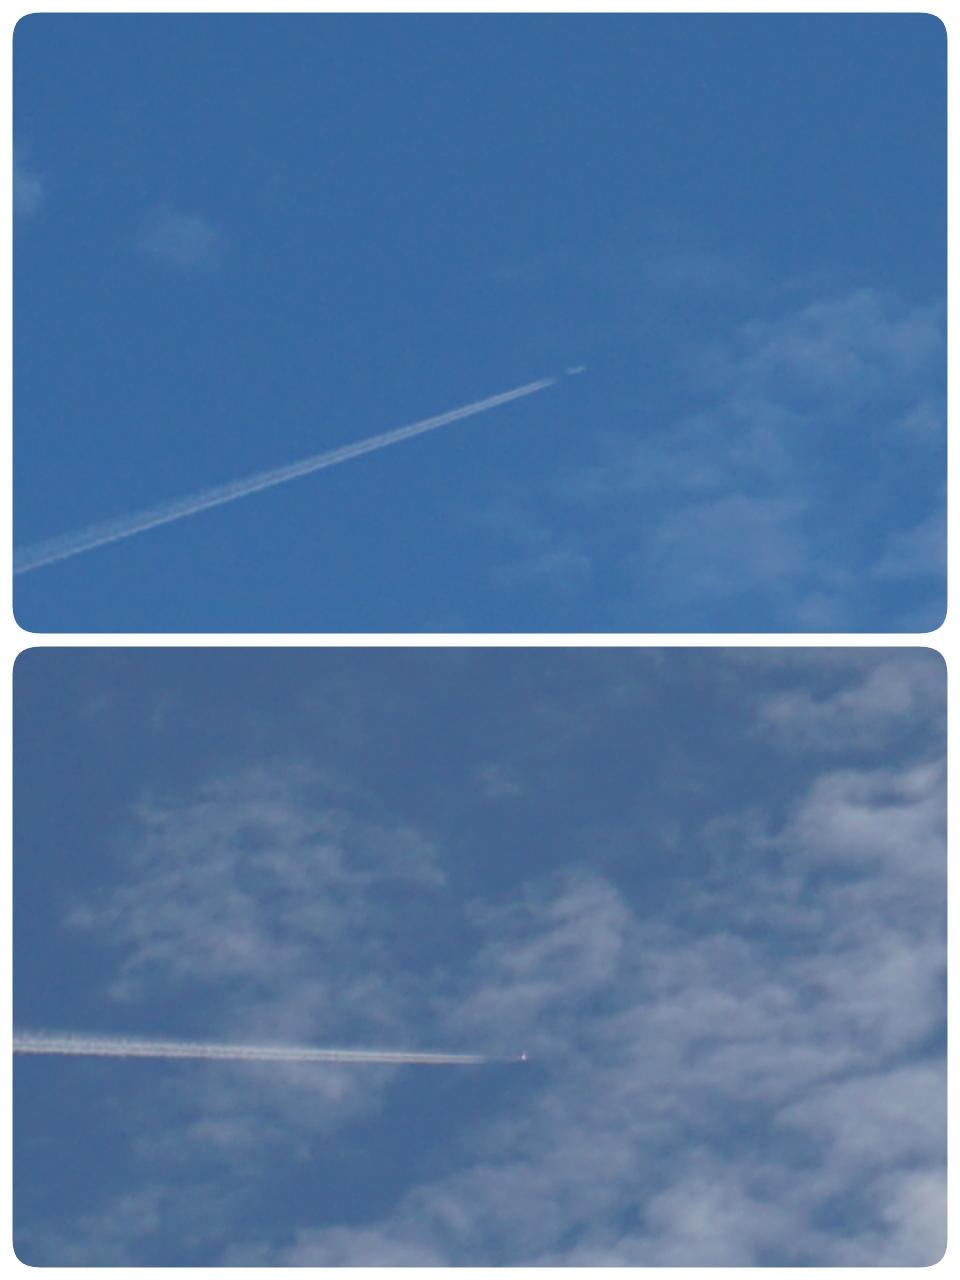 16-09-05-13-53-30-906_deco.jpg